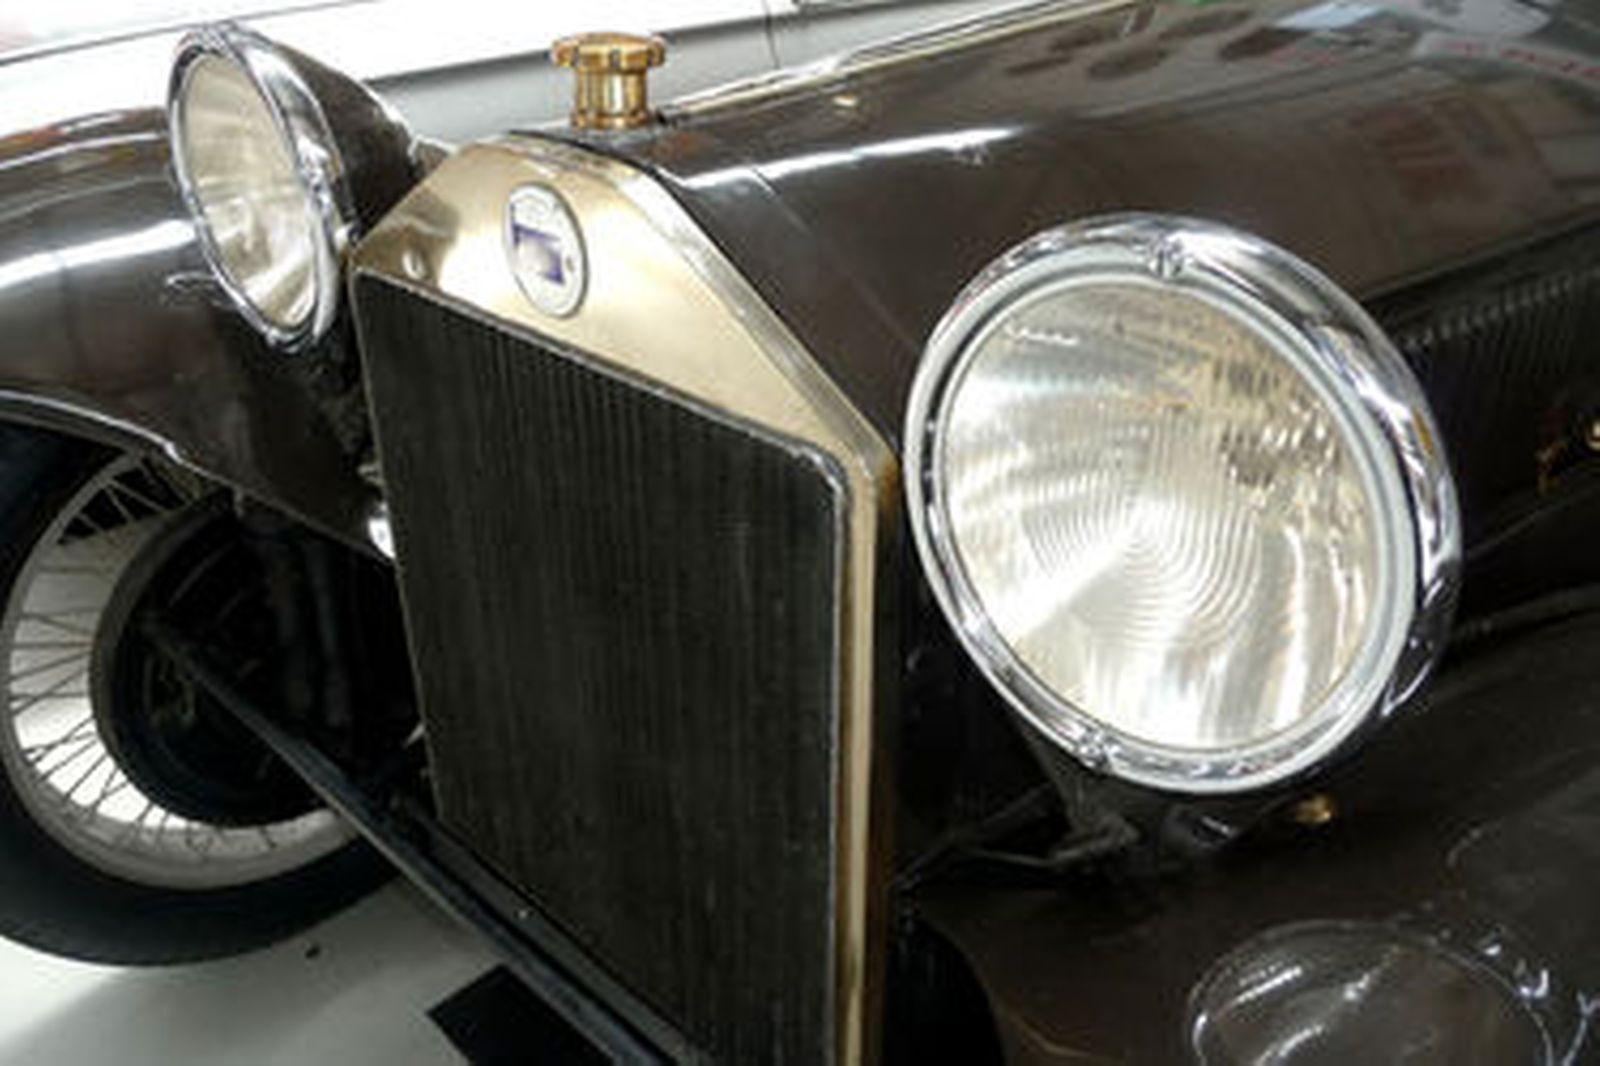 https://www.shannons.com.au/library/images/auctions/U2Q8O3X9W4L5I6X9/1600x1066/1926-lancia-lambda-6-series-tourer.jpg